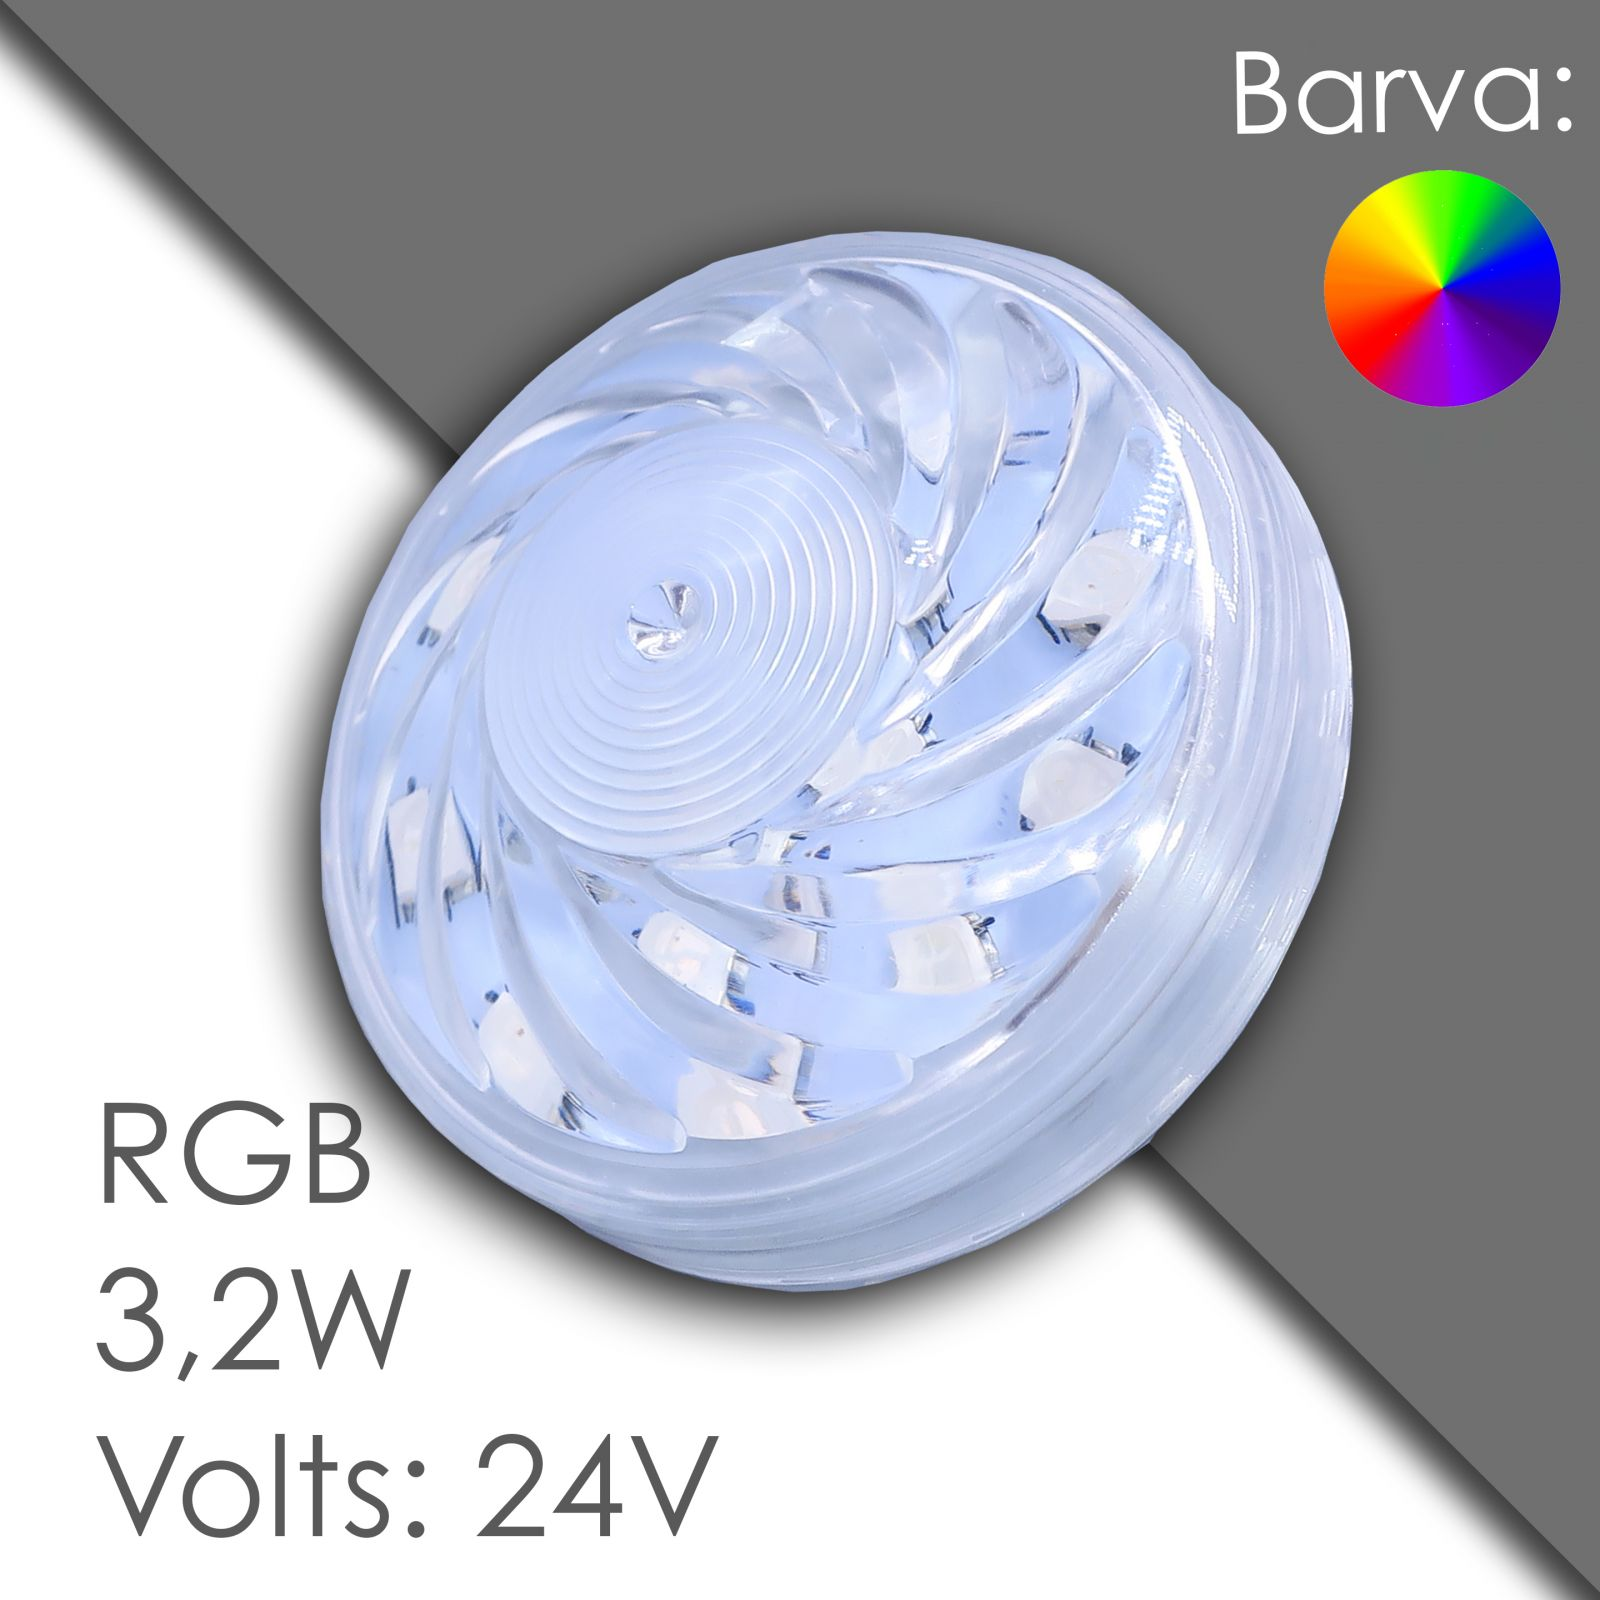 Led RGB 60mm automatic, waterproof